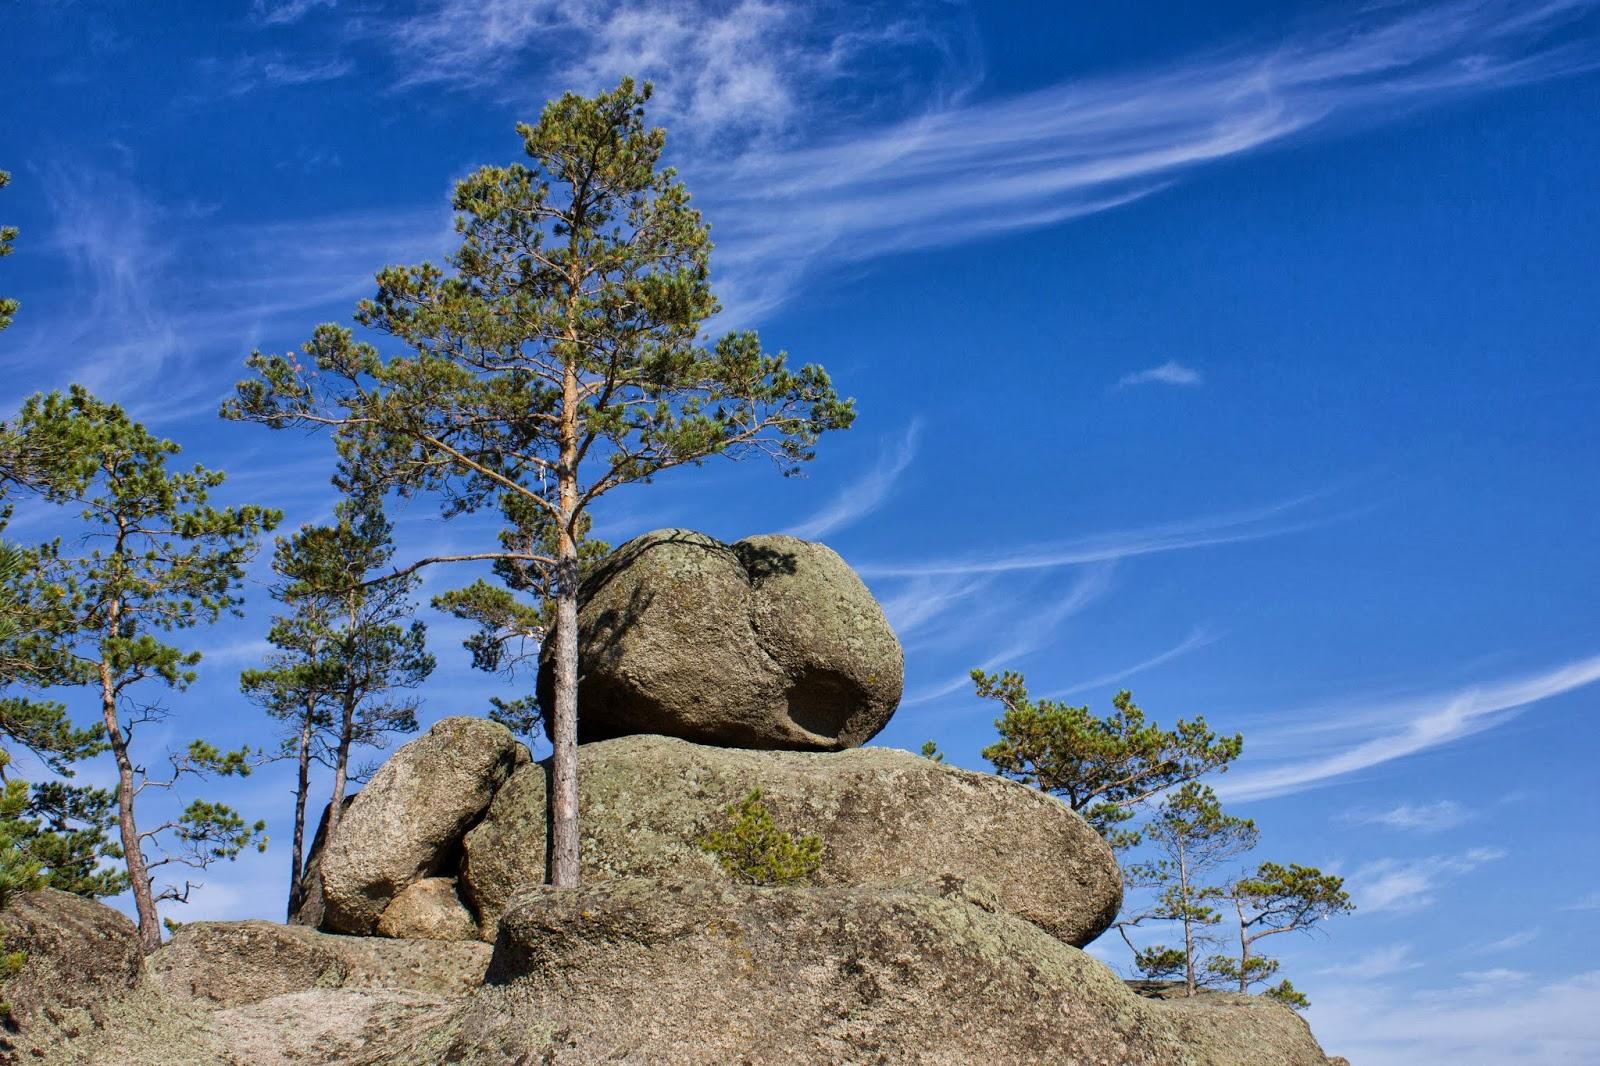 Казахстан, Боровое, Бурабай, Дерево из камня